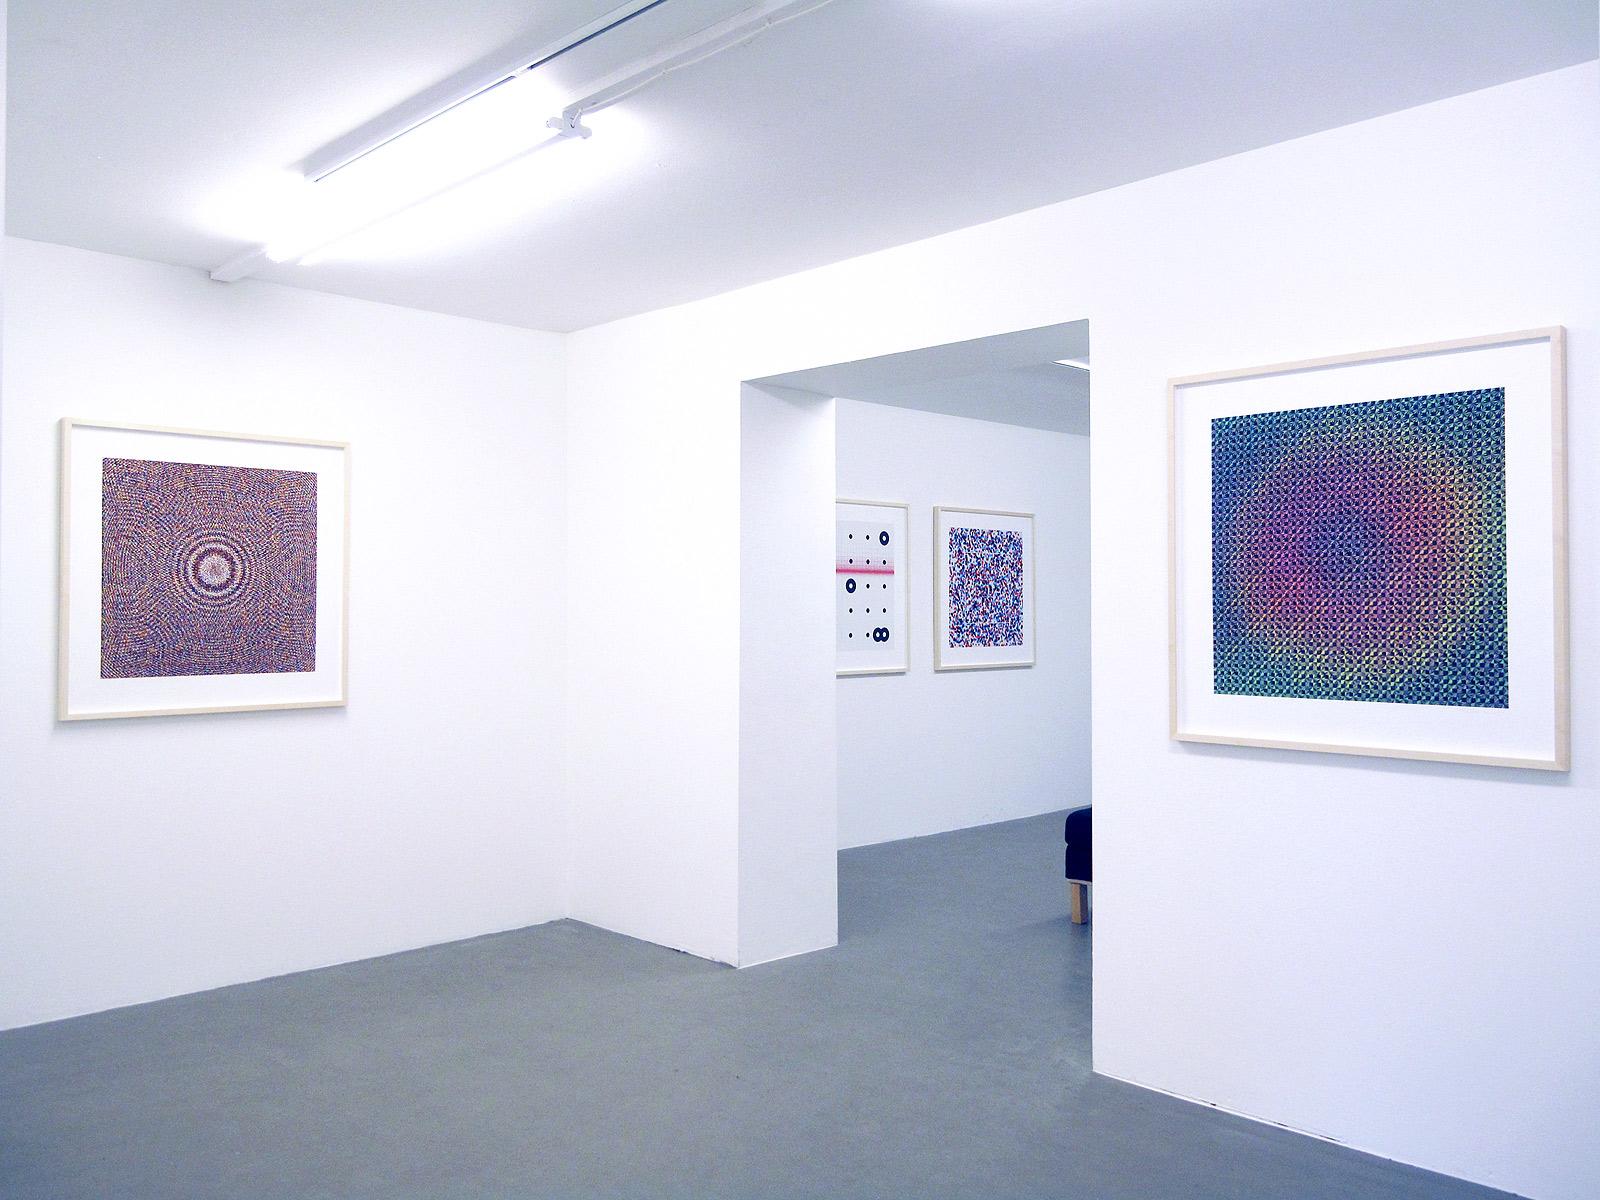 Gustav Sparr, Holographic Plate, 2016, Hologram Grid Paper, 2016, both Inkjet print, ed. 9+2, both 90 x 95 cm